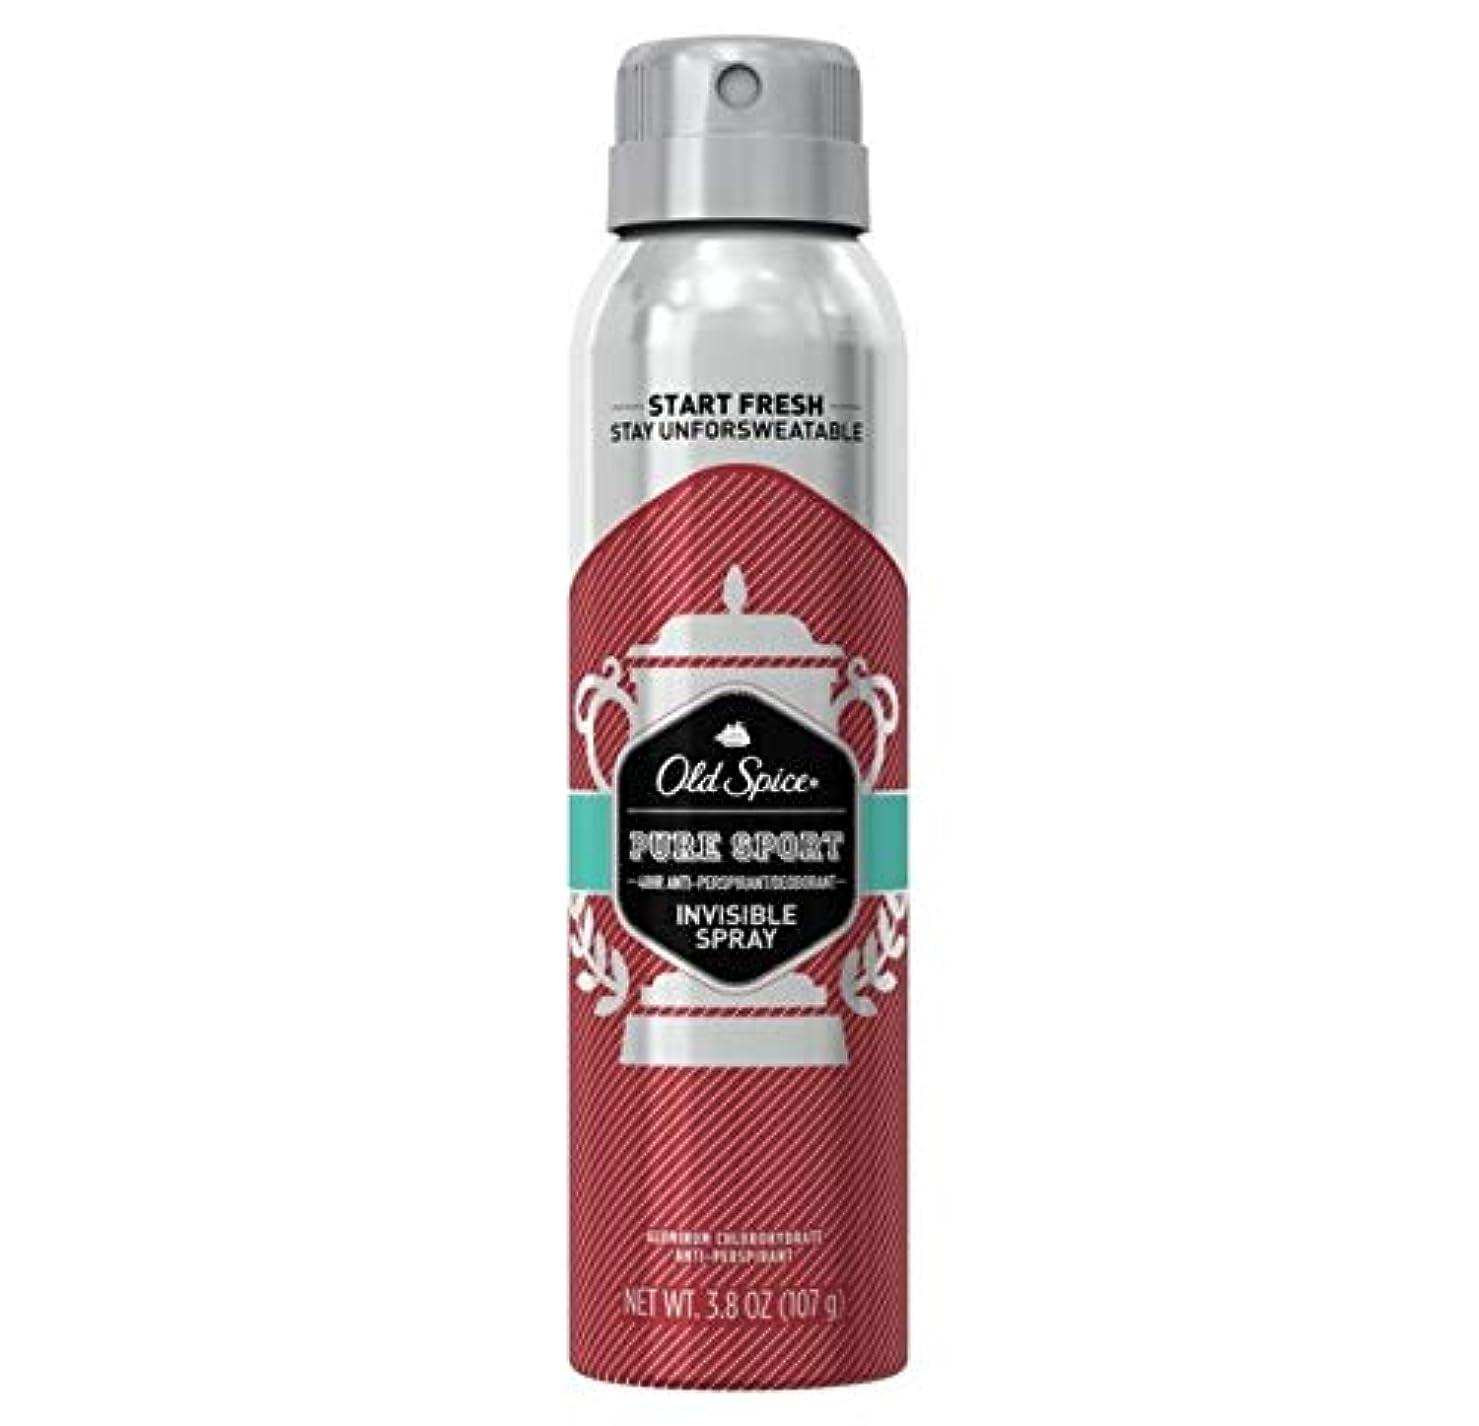 Old Spice Pure Sport Invisible Spray Antiperspirant and Deodorant - 3.8oz オールドスパイス インビジブルスプレー ピュアスポーツ 107g [並行輸入品]